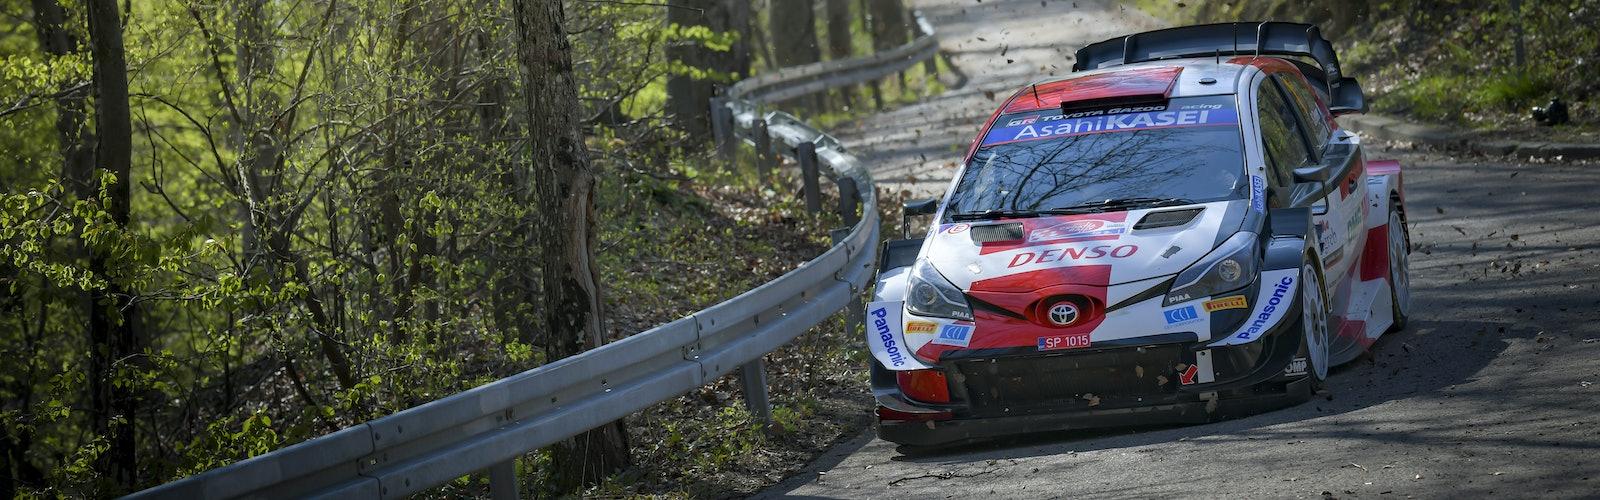 WRC_2021_Rd.3_194